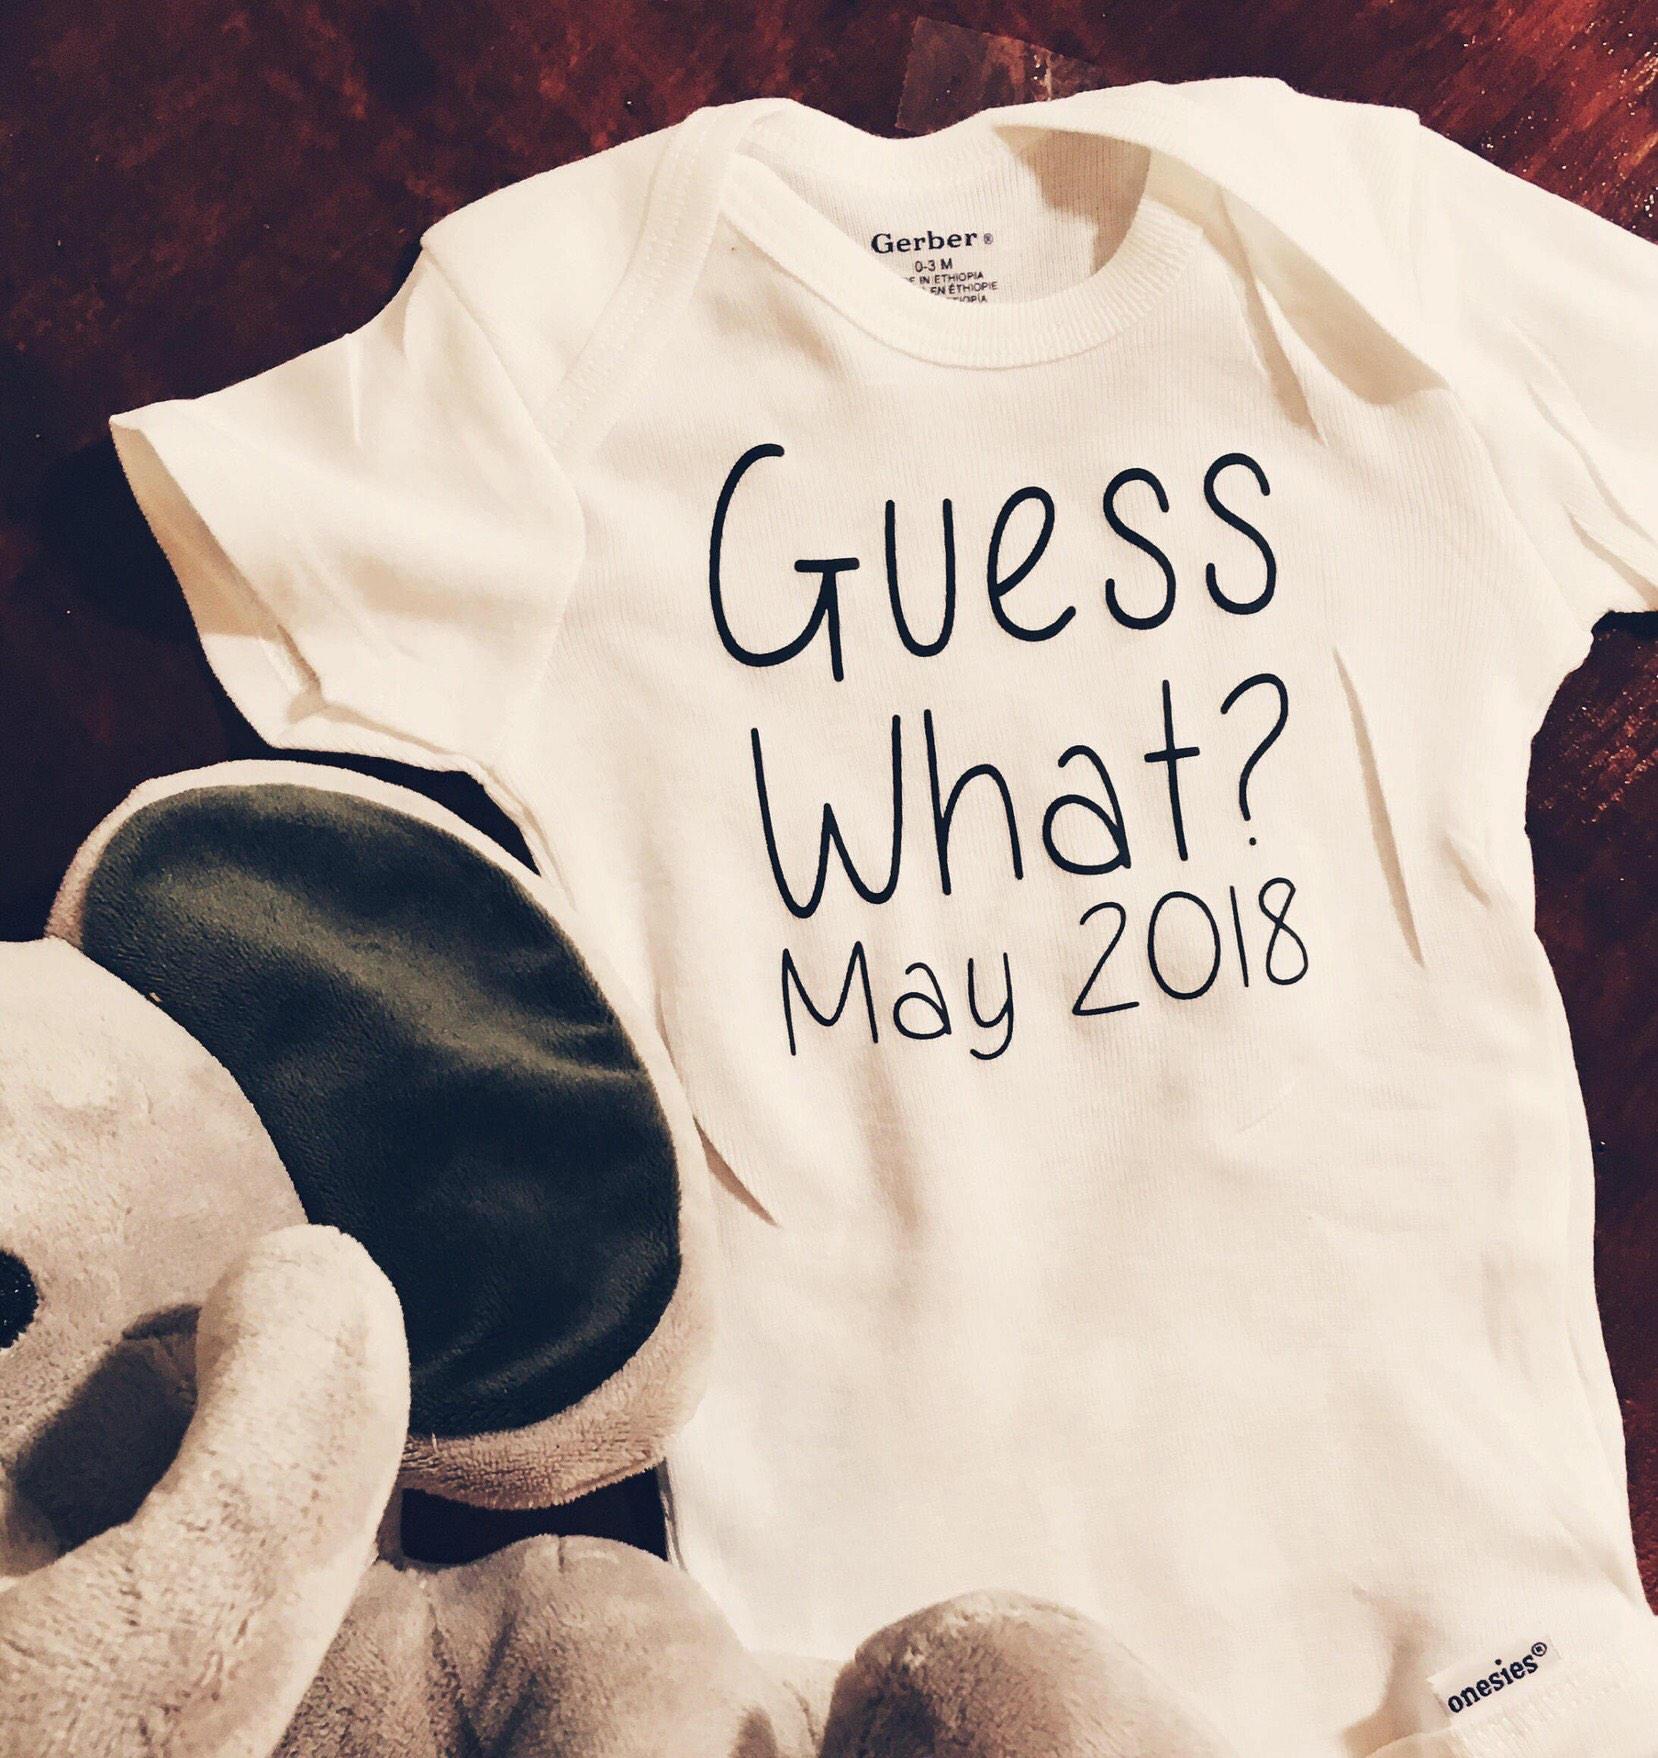 Baby Announcement Onesie Coming Soon Baby AnnouncementPregnancy – Grandparents Baby Announcement